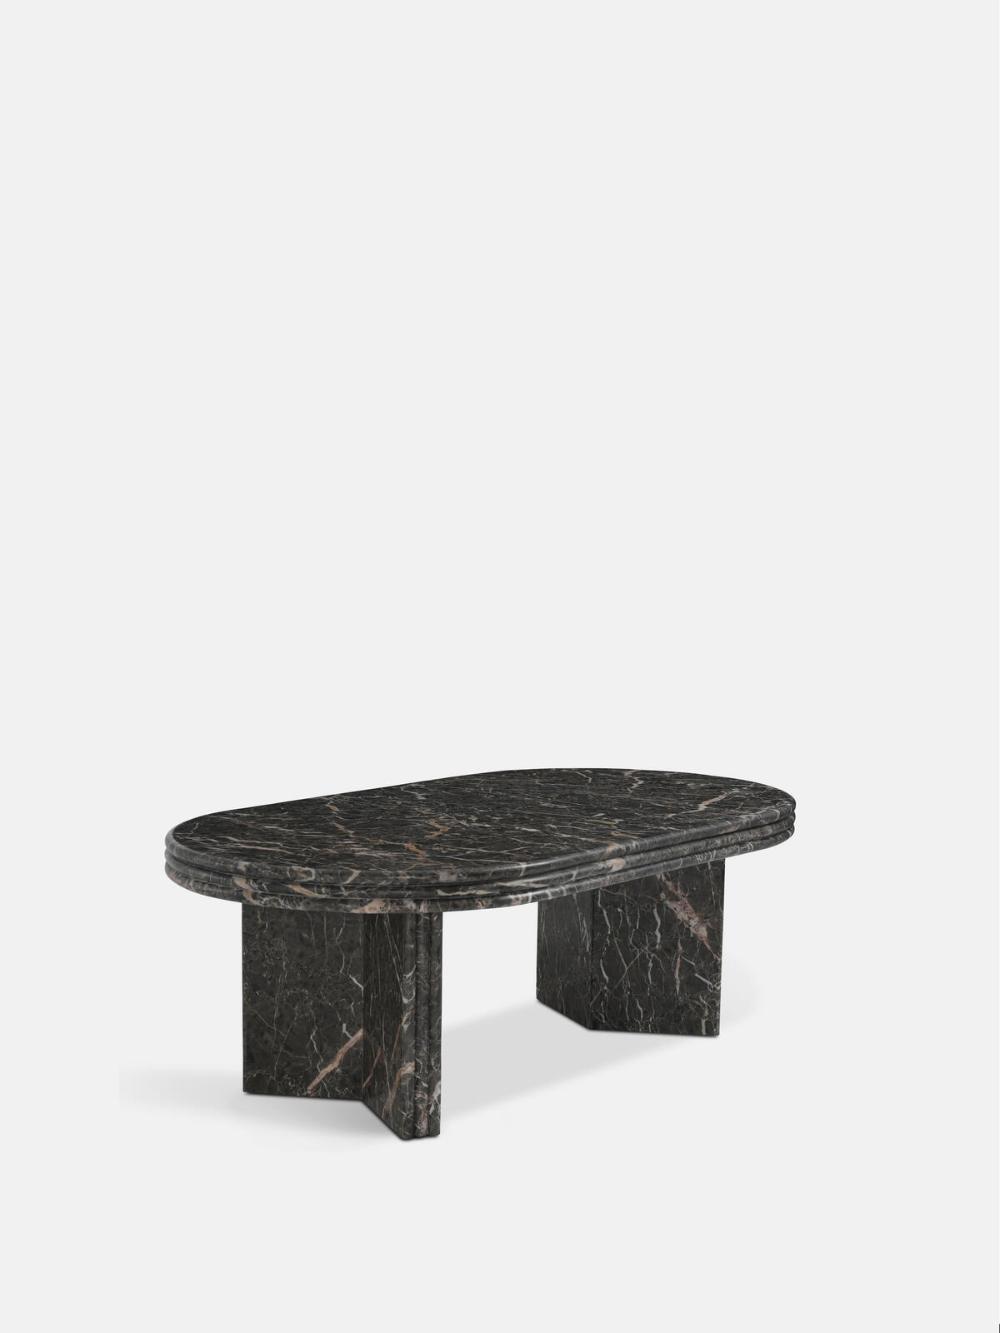 Rosaline Coffee Table Soho Home Coffee Table Home Coffee Tables Stylish Coffee Table [ 1333 x 1000 Pixel ]